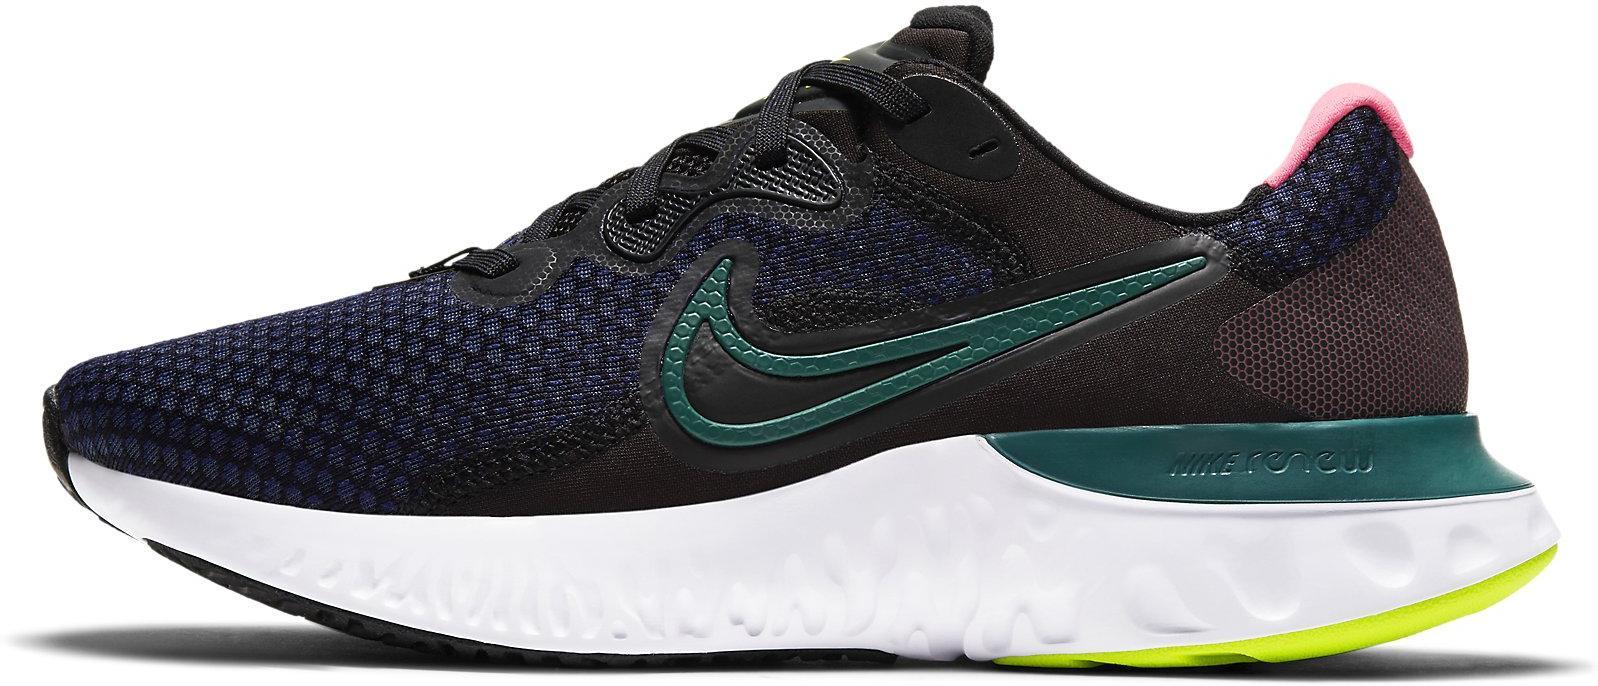 Zapatillas de running Nike Renew Run 2